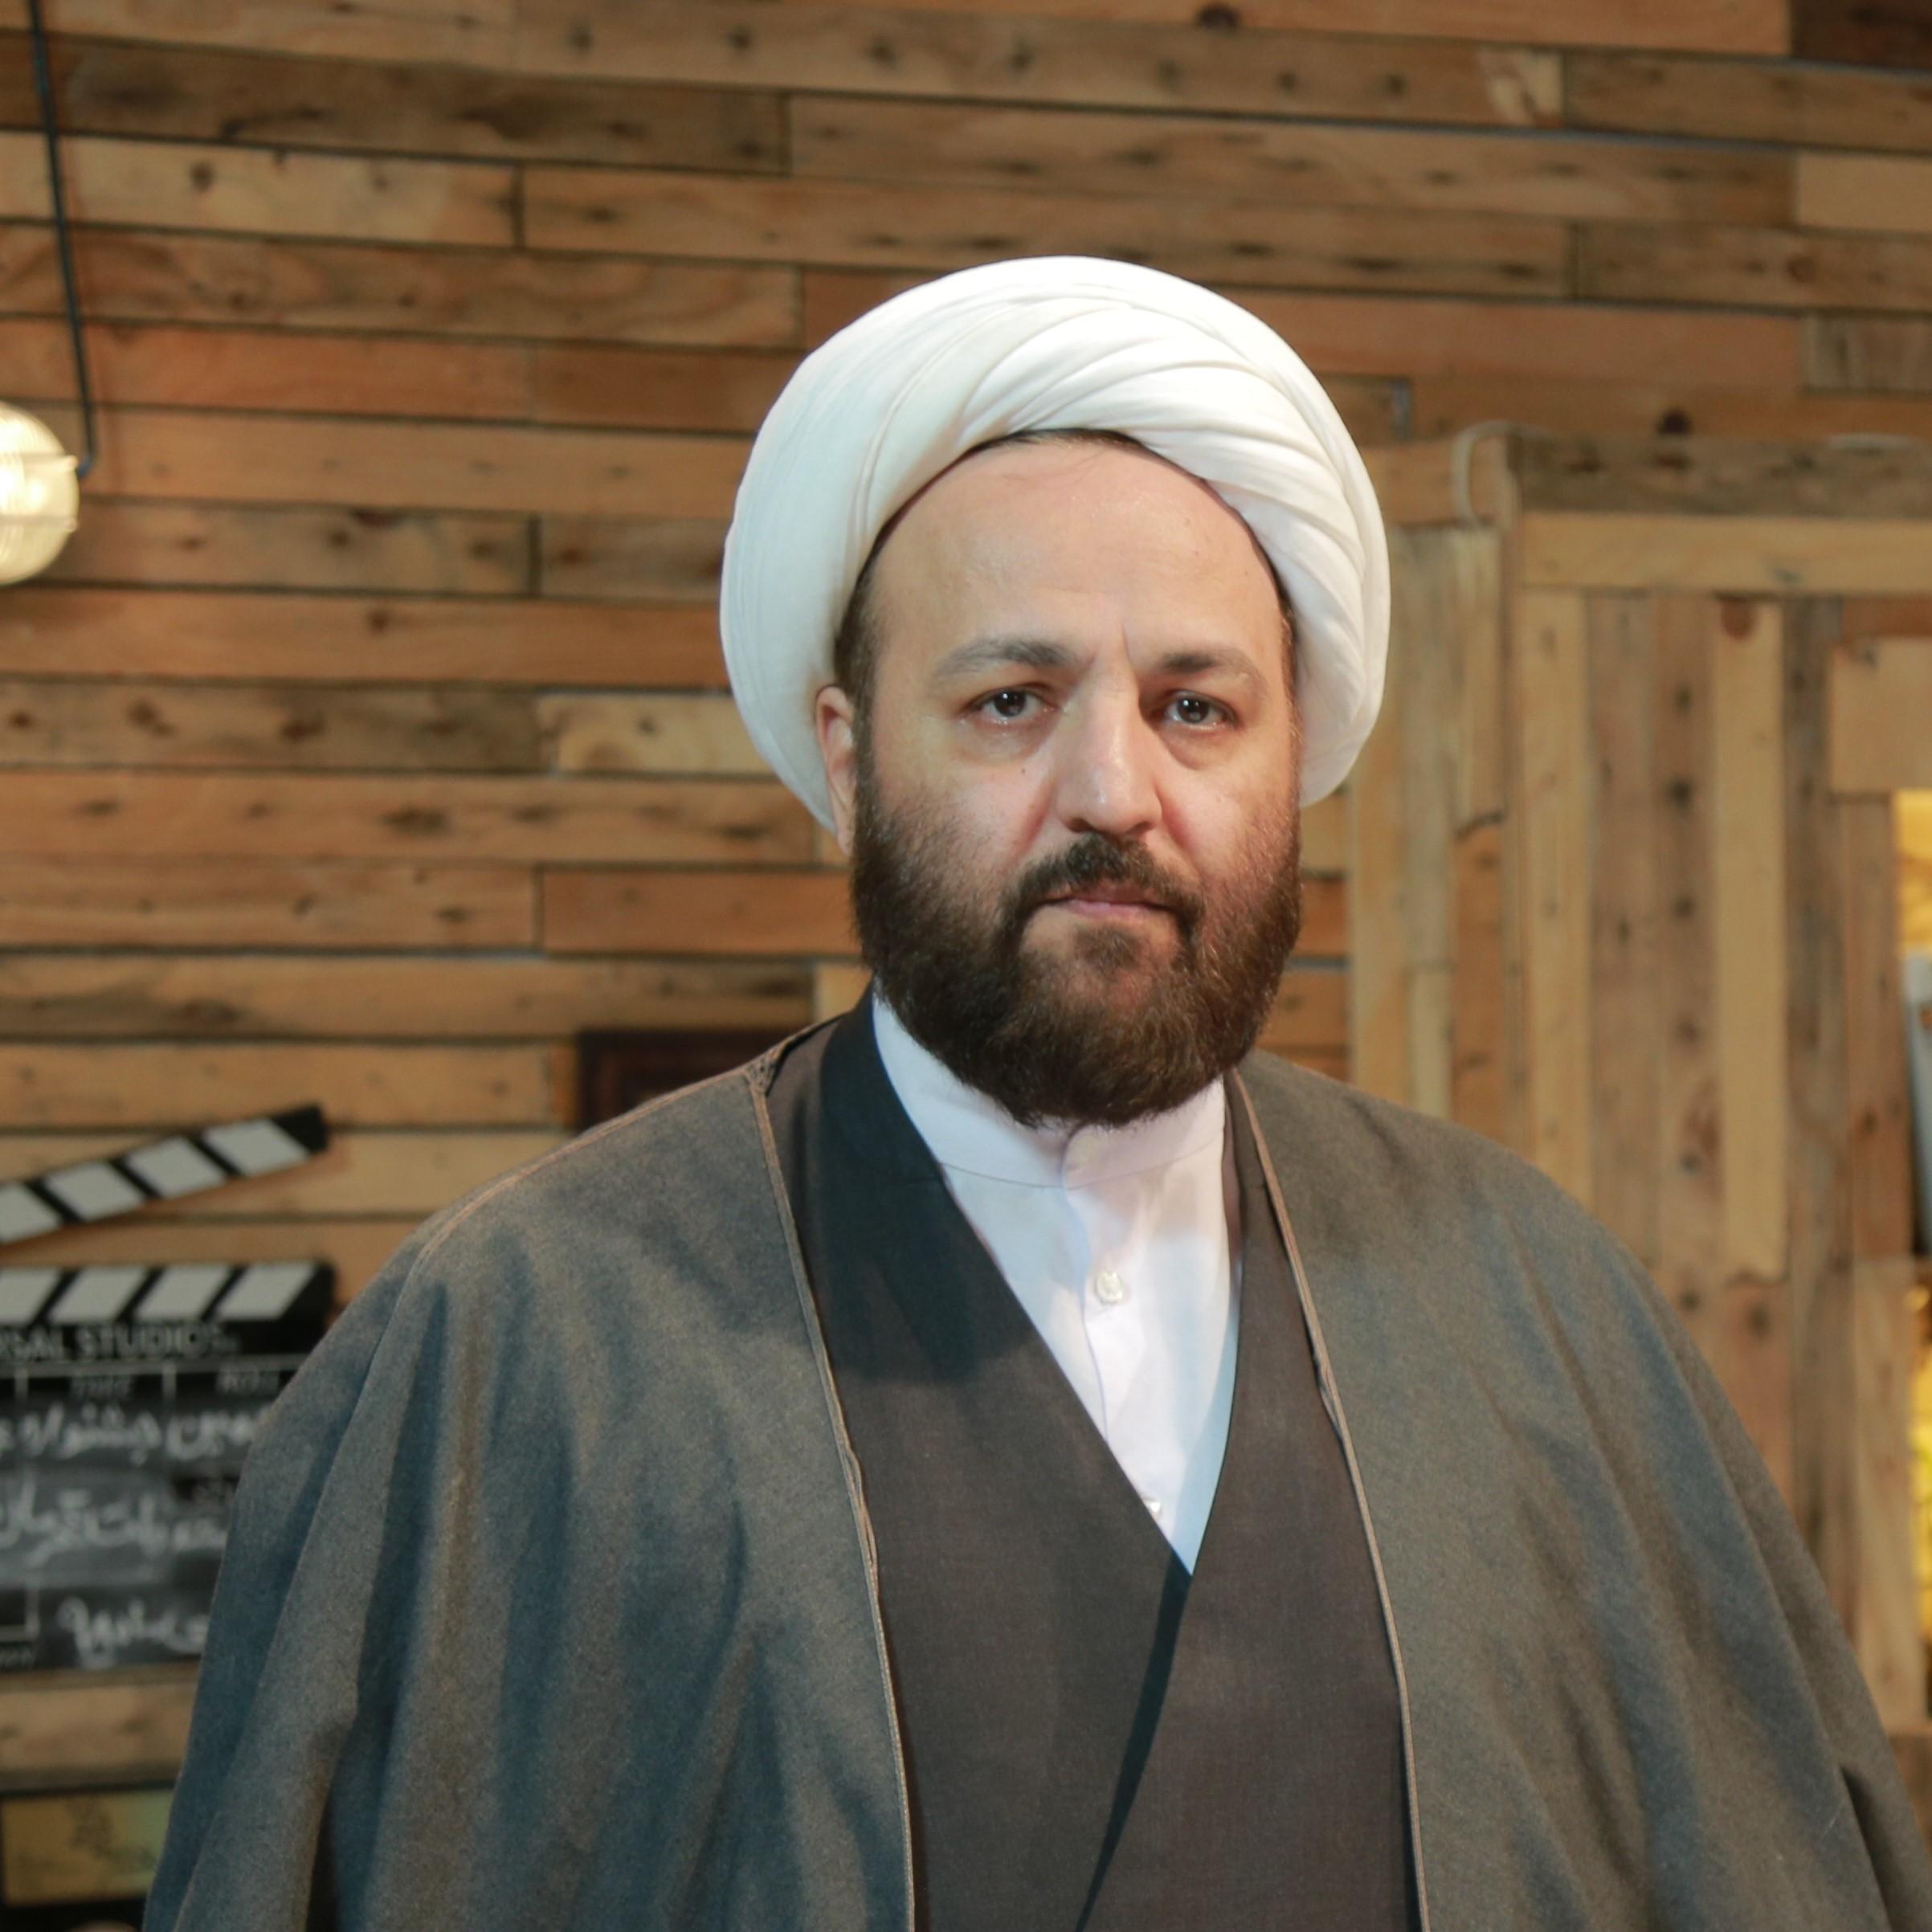 حجت الاسلام محمدعلی حیدری